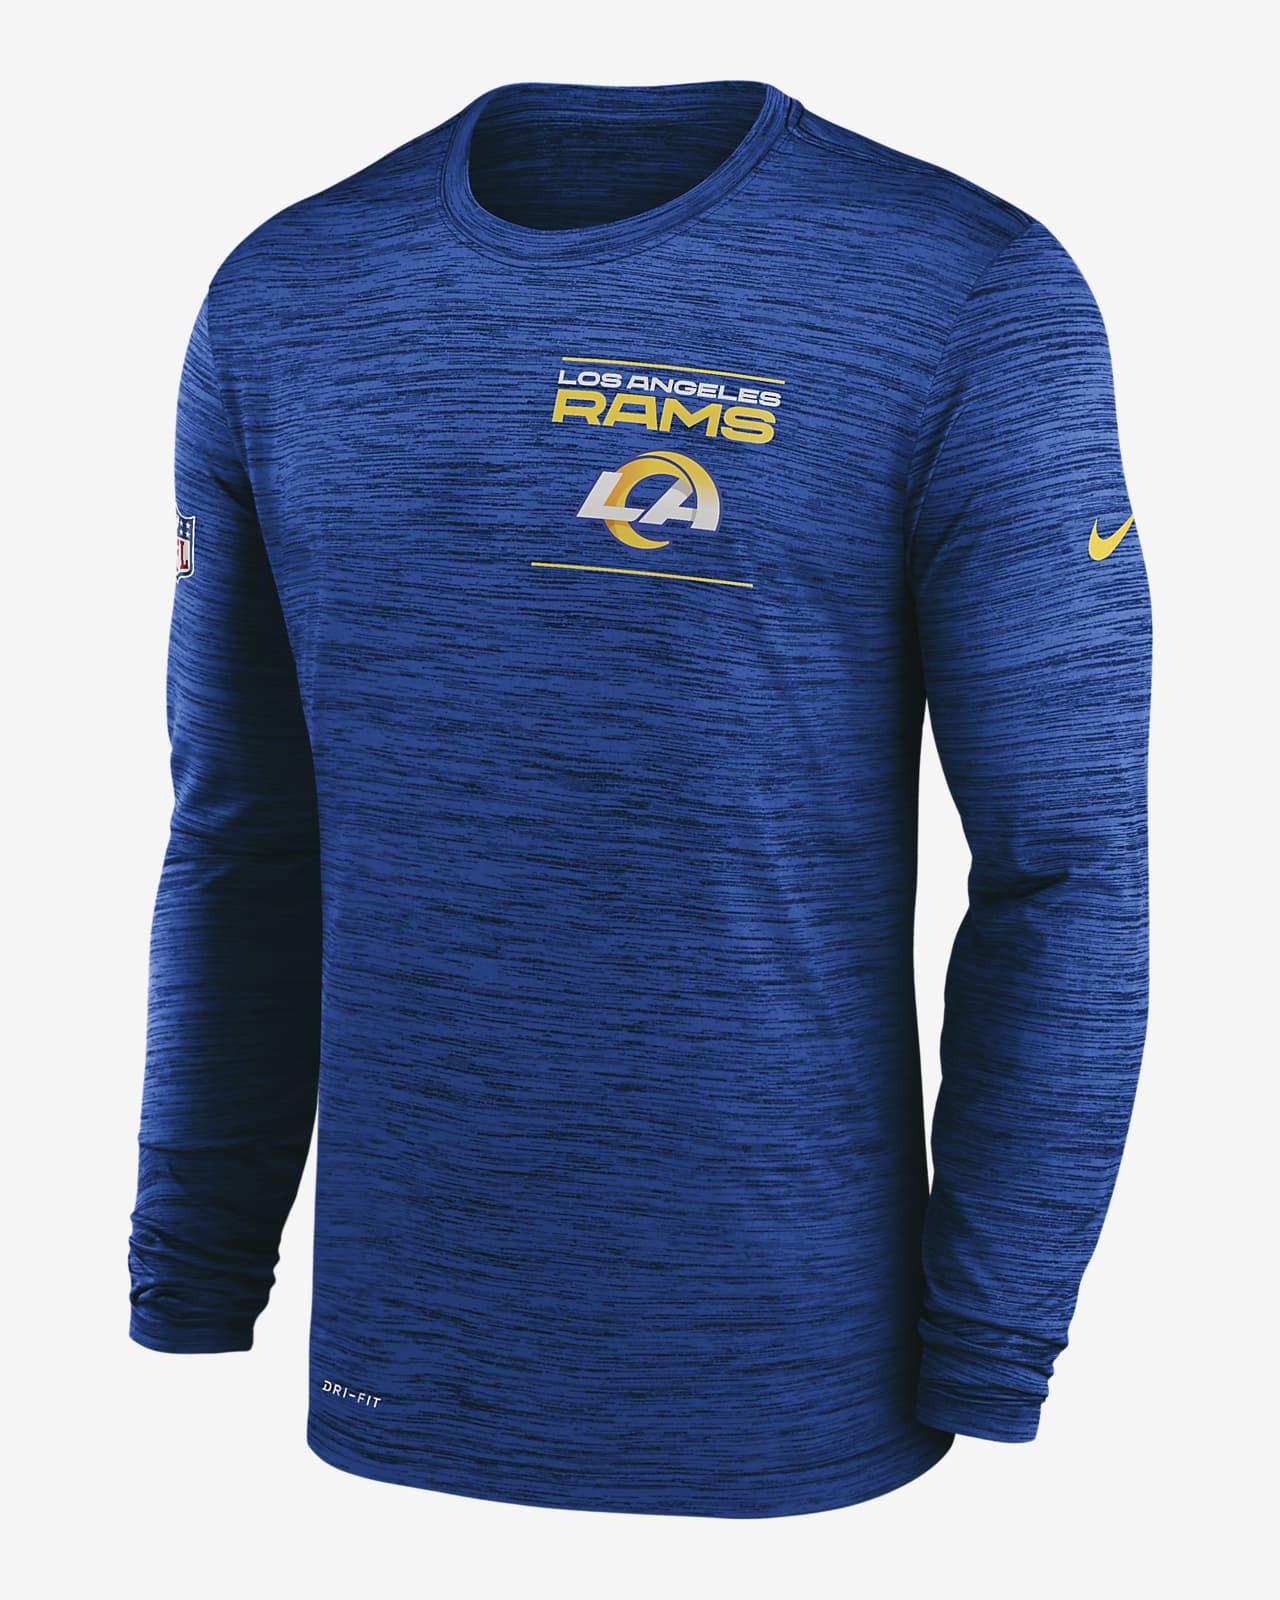 Nike Dri-FIT Sideline Velocity Legend (NFL Los Angeles Rams) Men's Long-Sleeve T-Shirt